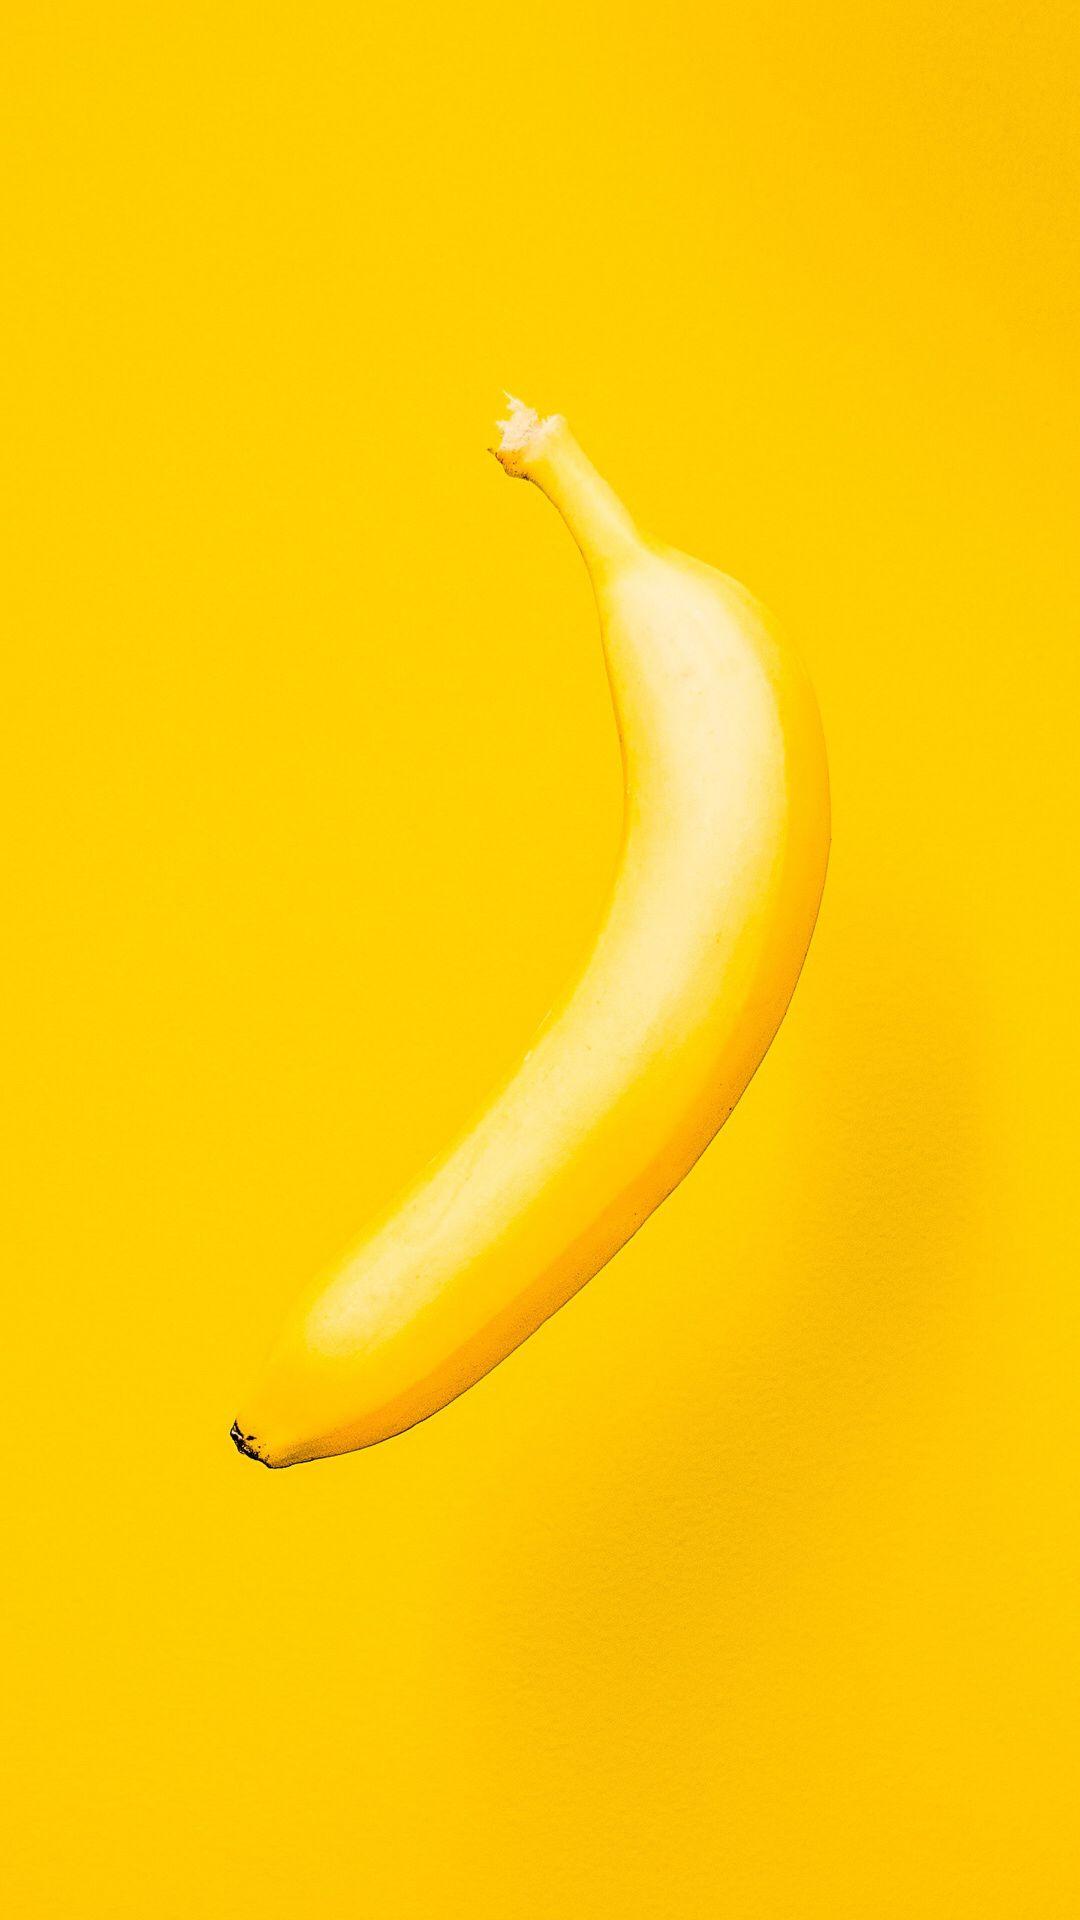 Aesthetic Banana Wallpapers - Wallpaper Cave